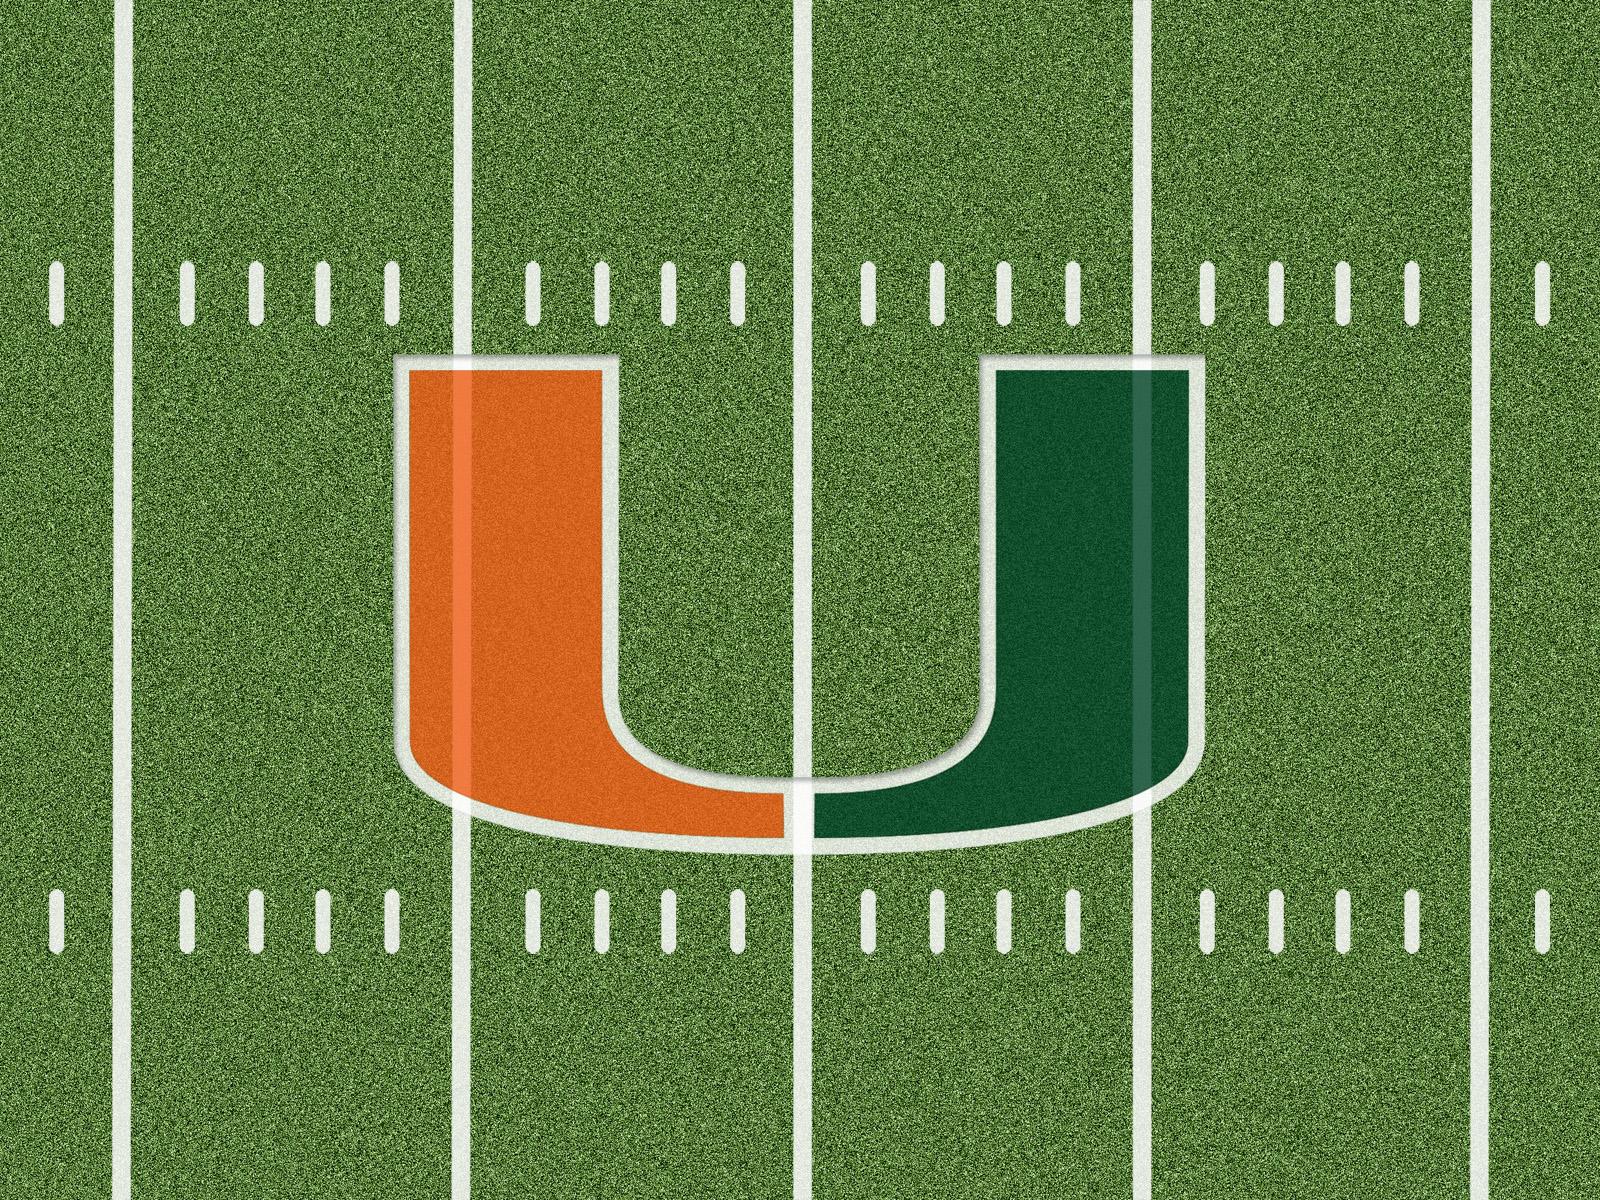 Miami Hurricanes Football Wallpaper 4996 Wallpaper WallpapersTube 1600x1200